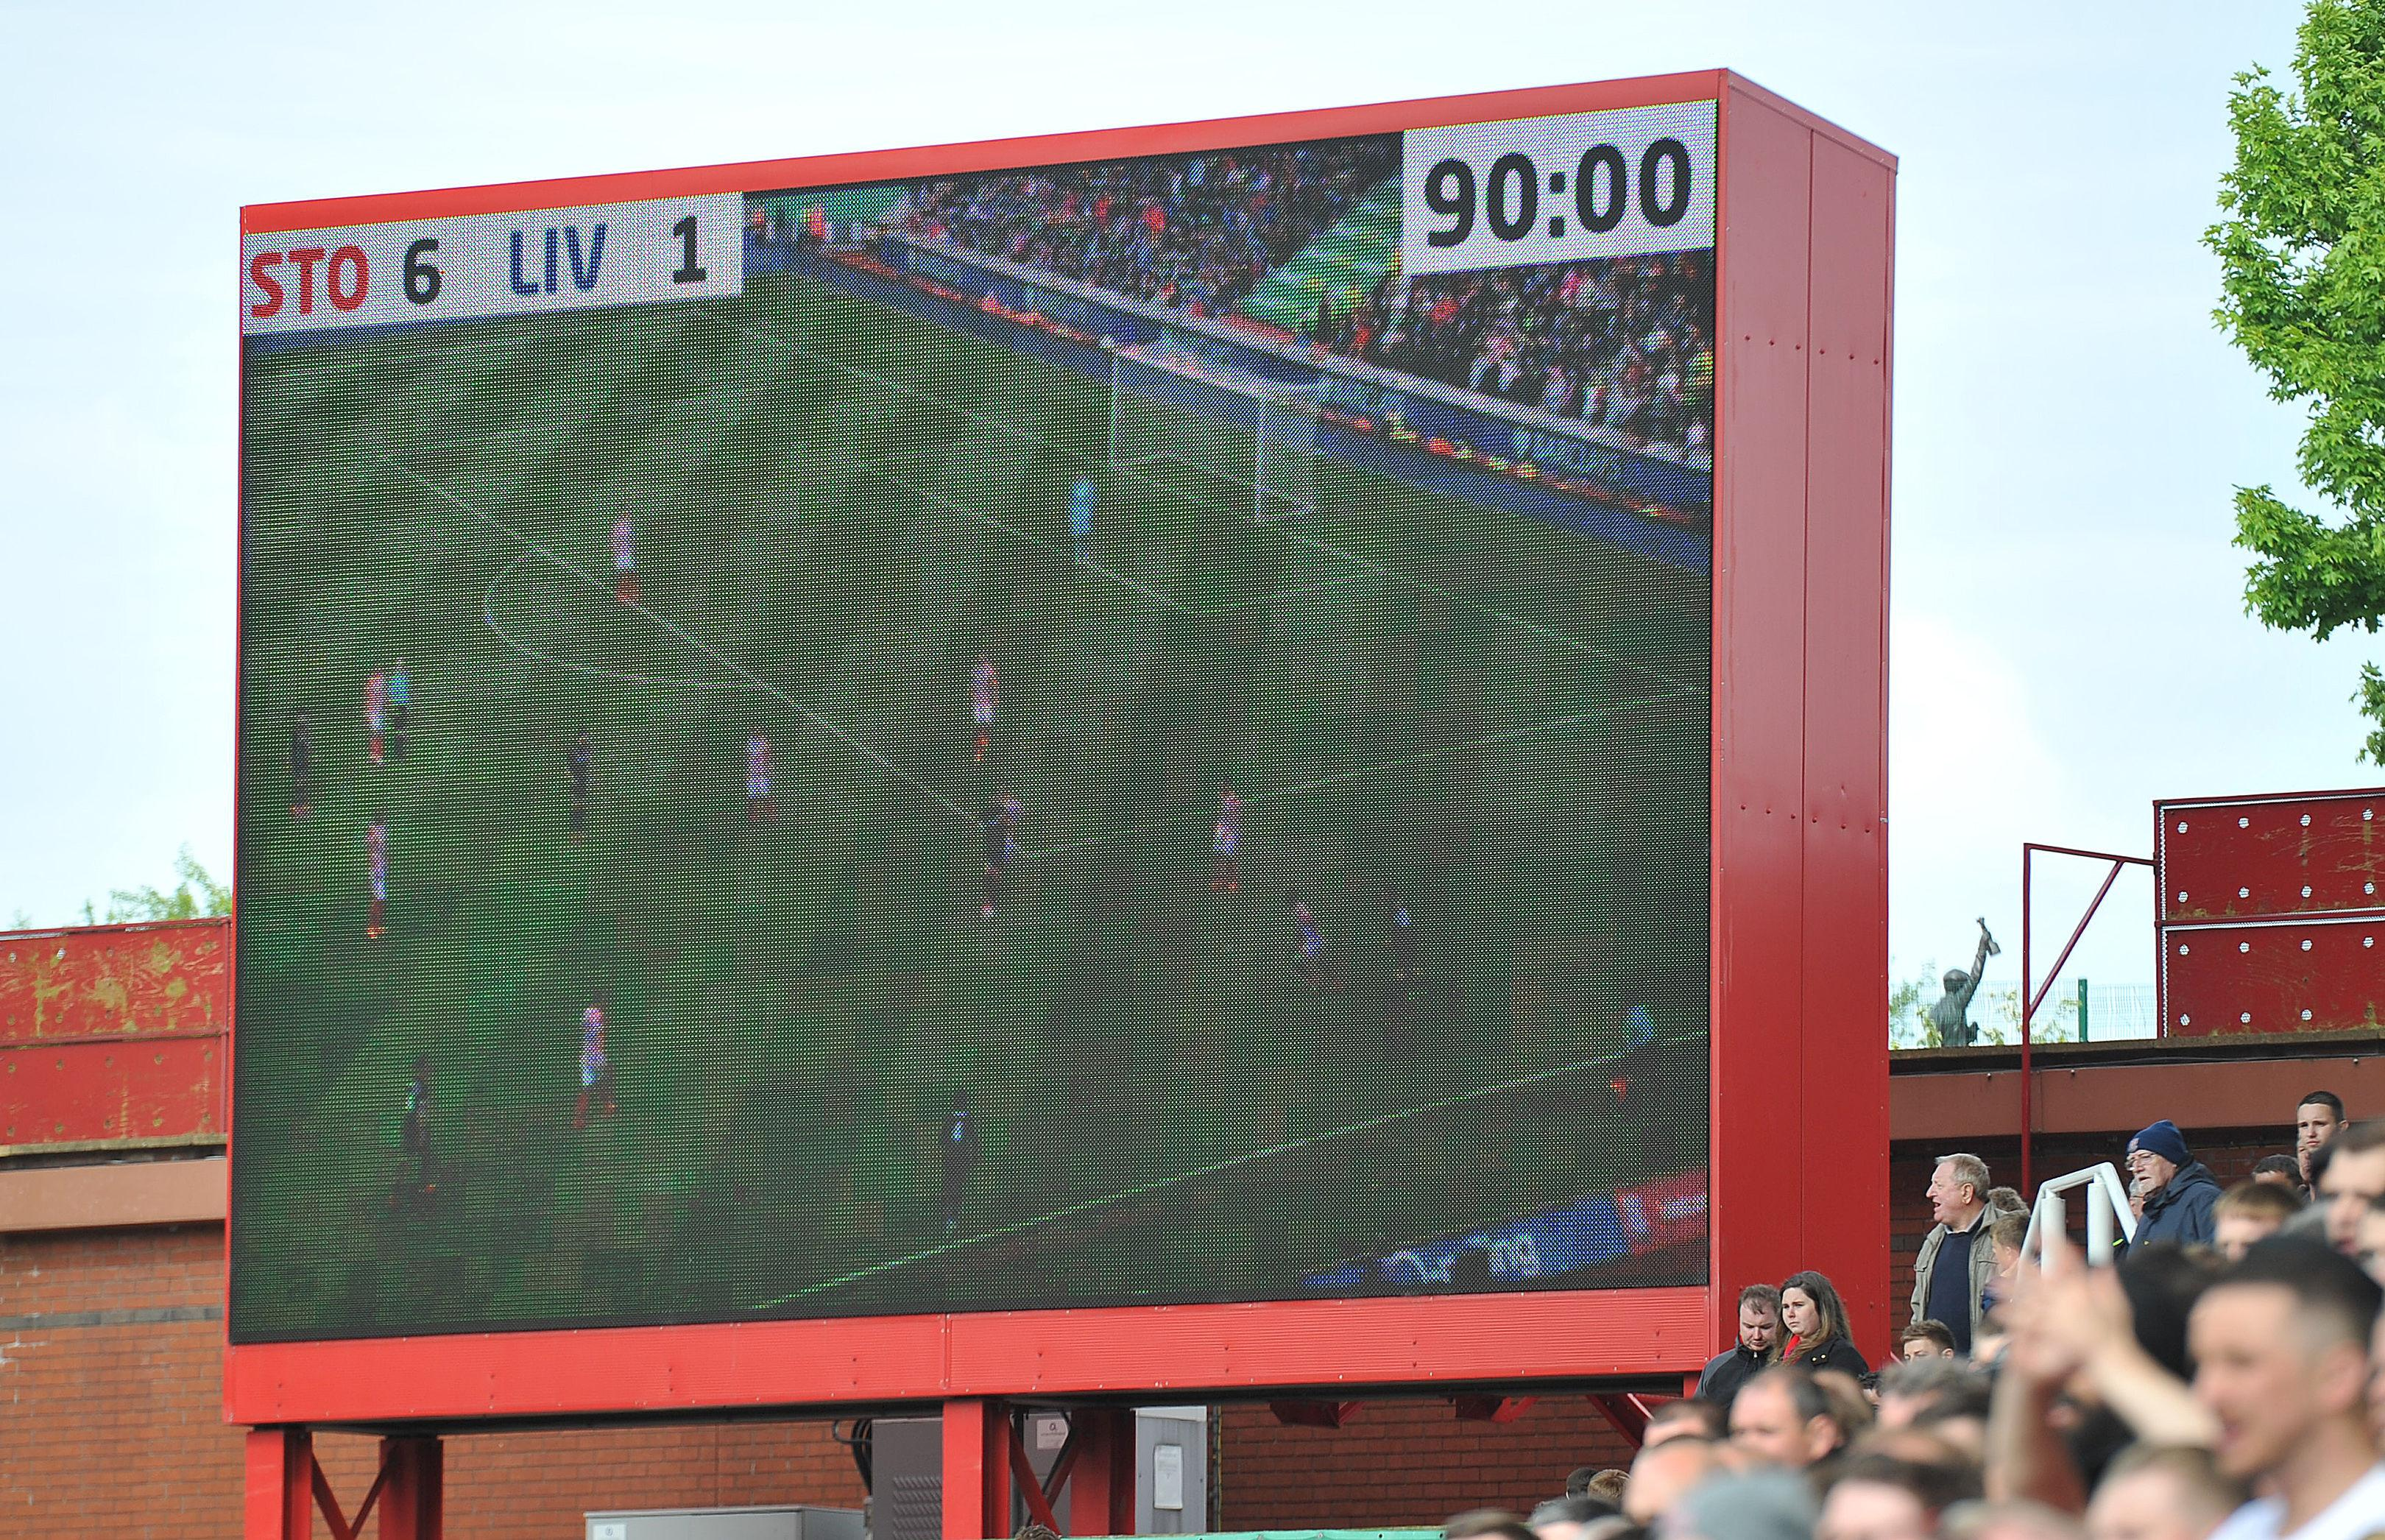 Liverpool fans, look away now